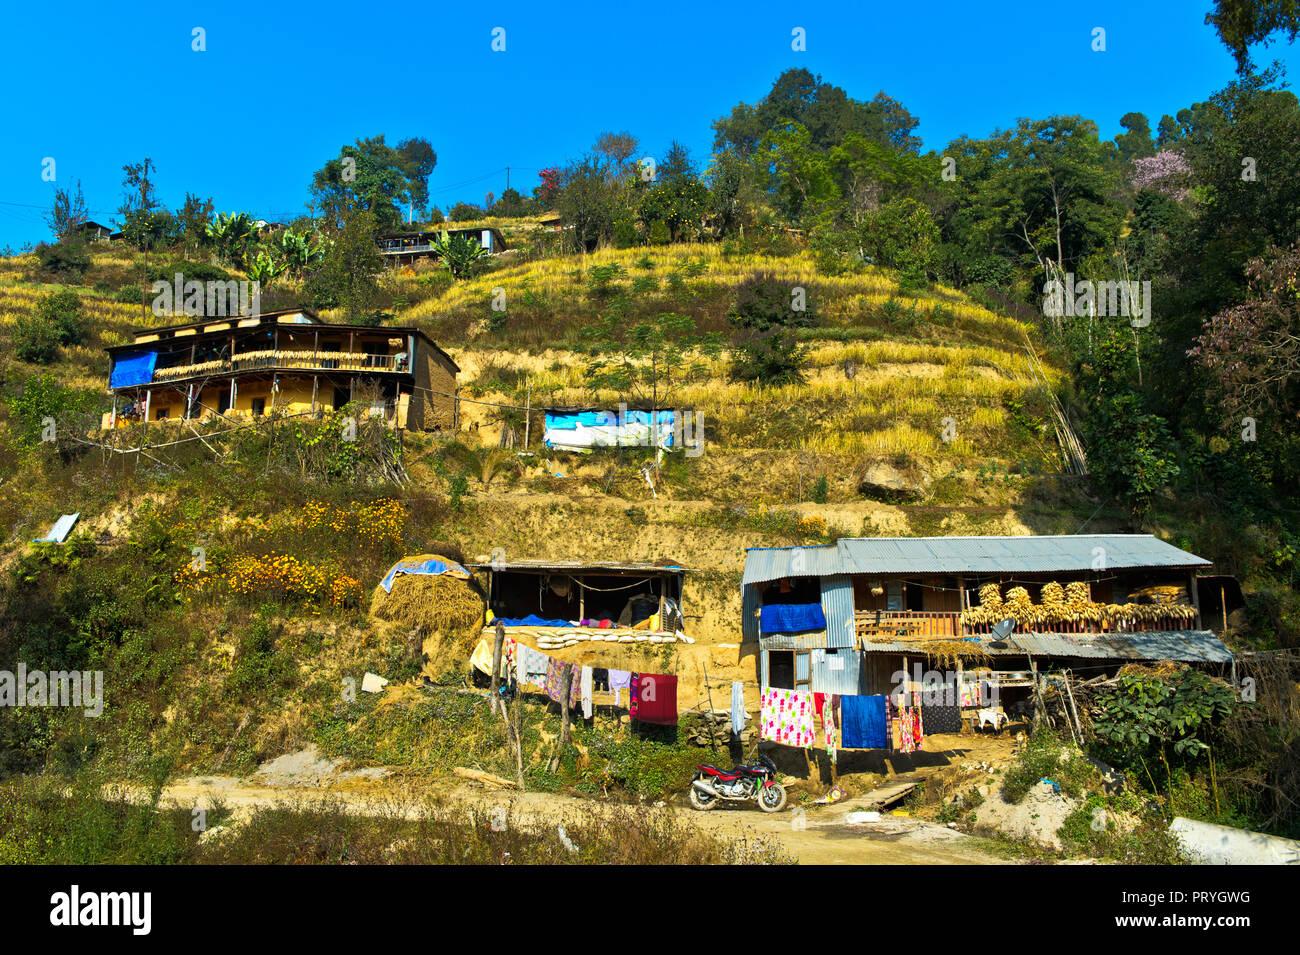 Terrace fields and farmstead near Nagarkot, Bhaktapur District, Kathmandu Valley, Nepal - Stock Image